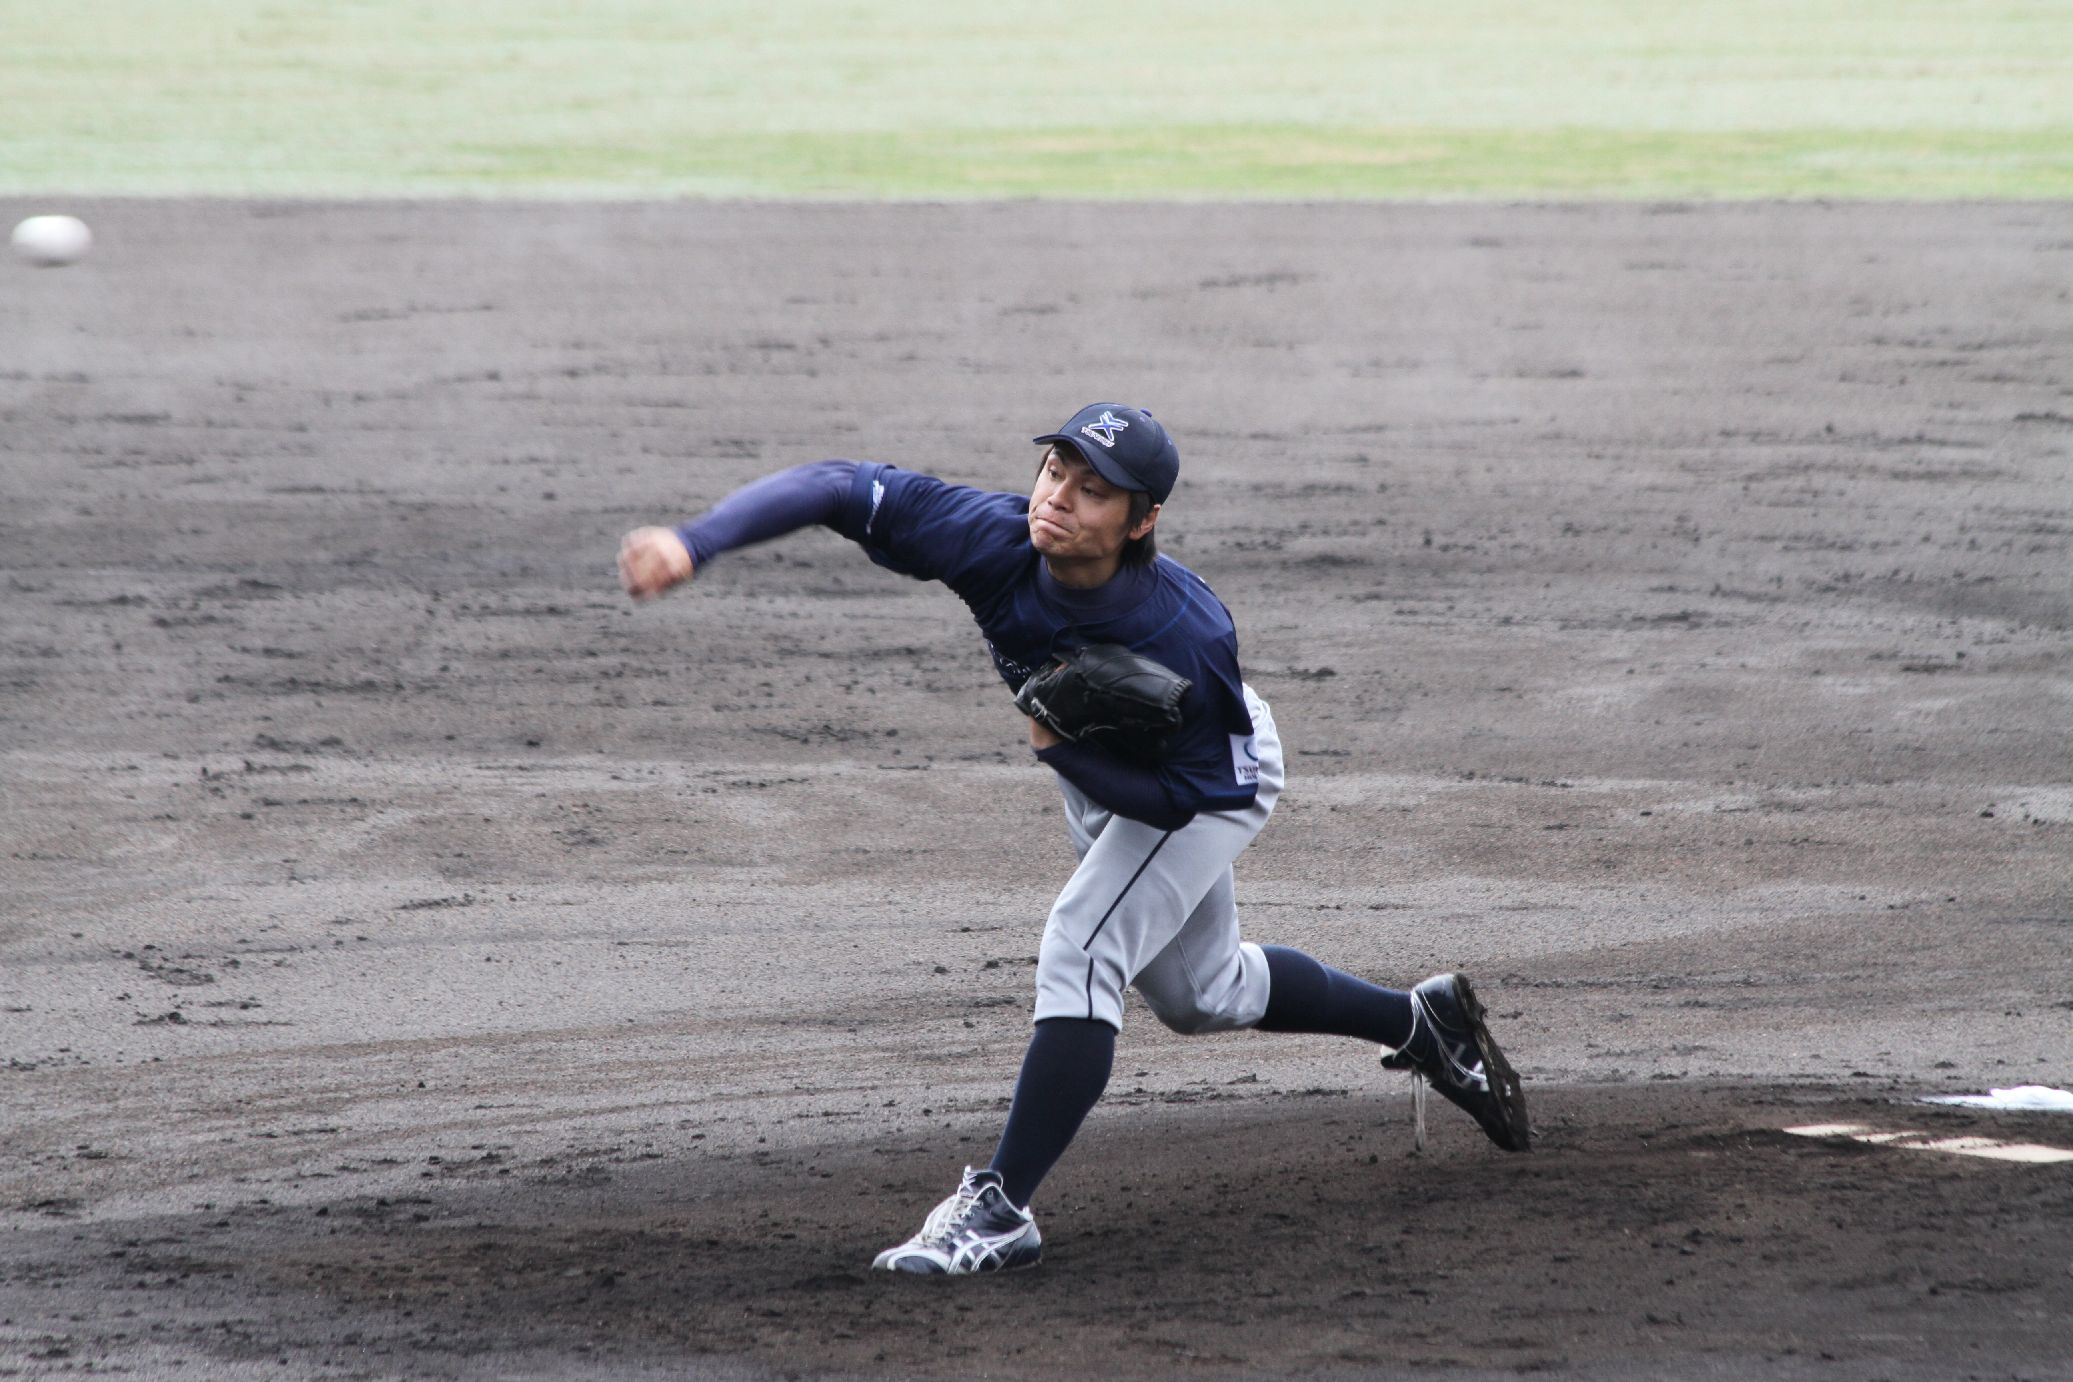 ツネイシ硬式野球部、第63回松本滝蔵旗・第51回三浦芳郎旗野球大会 準優勝!